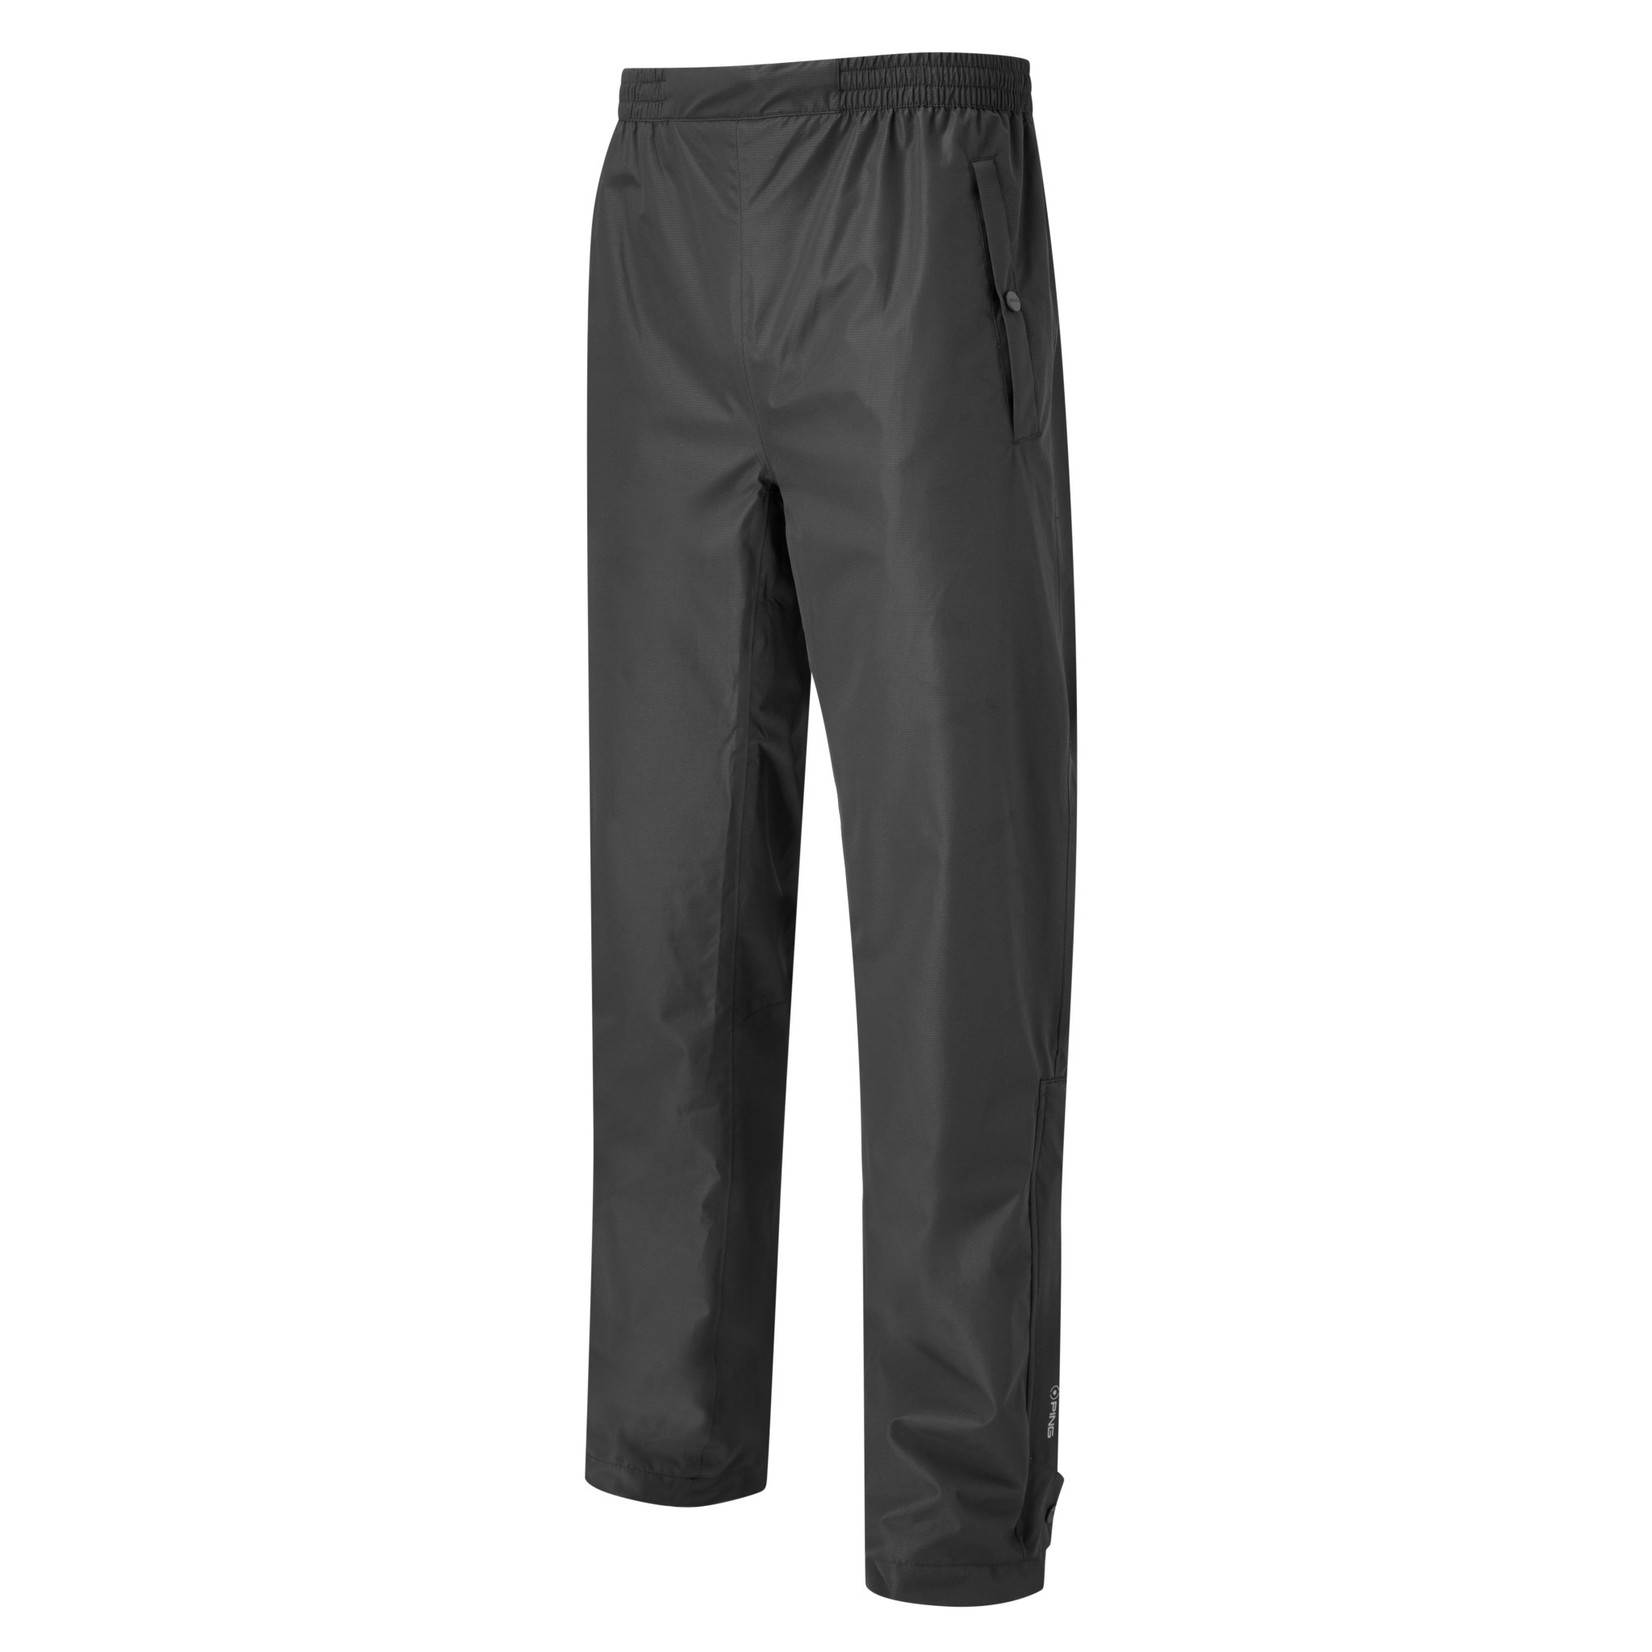 Ping Ping Sensordry Pant - Black